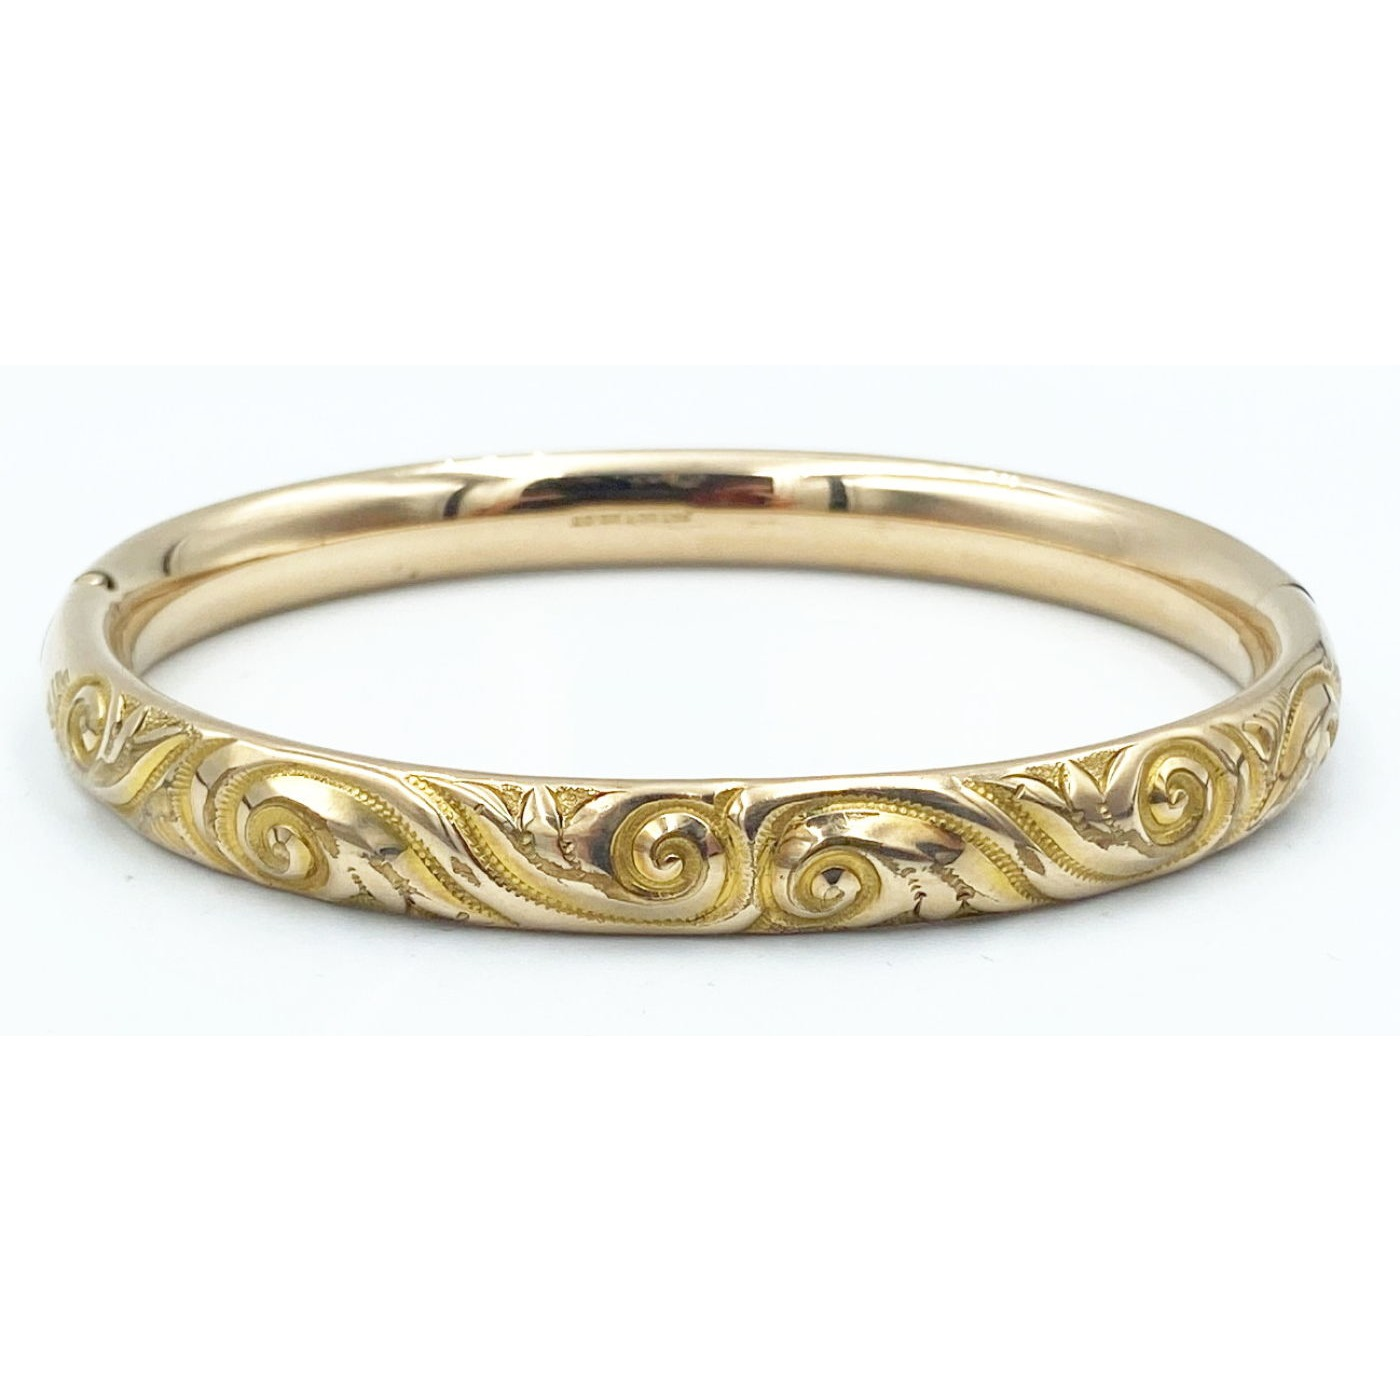 Stunning Narrow Deeply Engraved Larger Bangle Bracelet